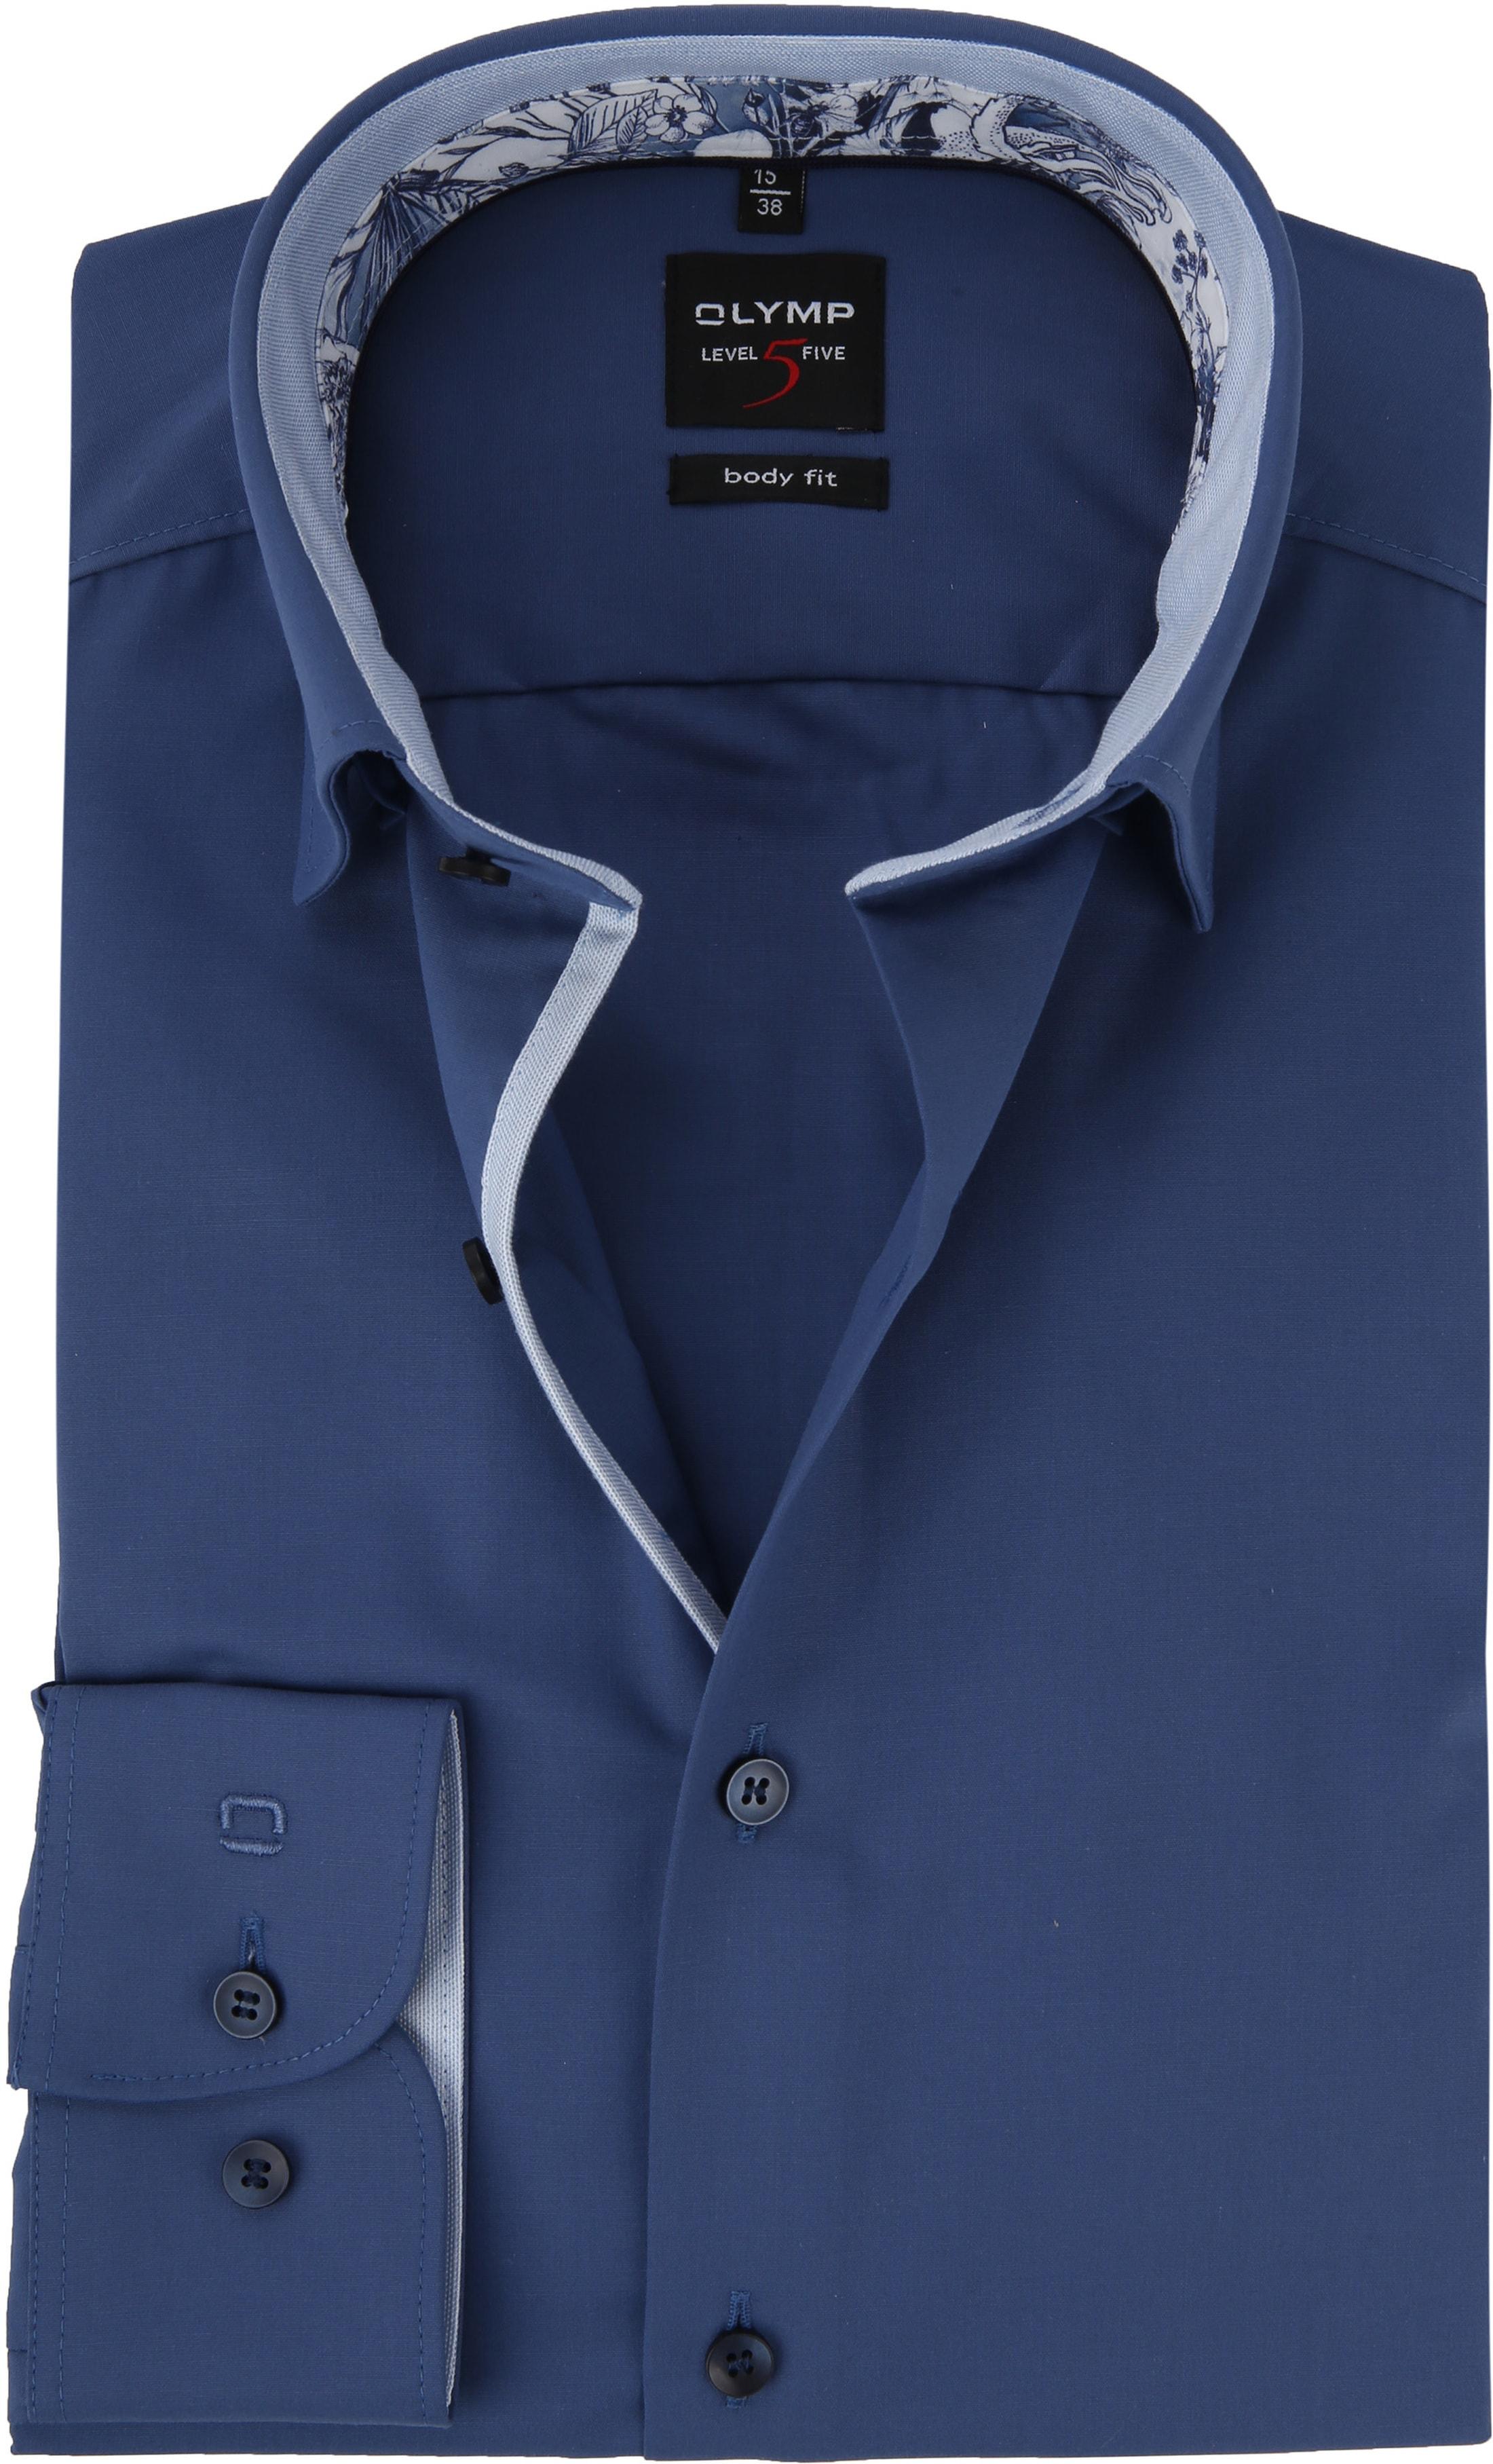 OLYMP Overhemd BF Level 5 Blauw foto 0